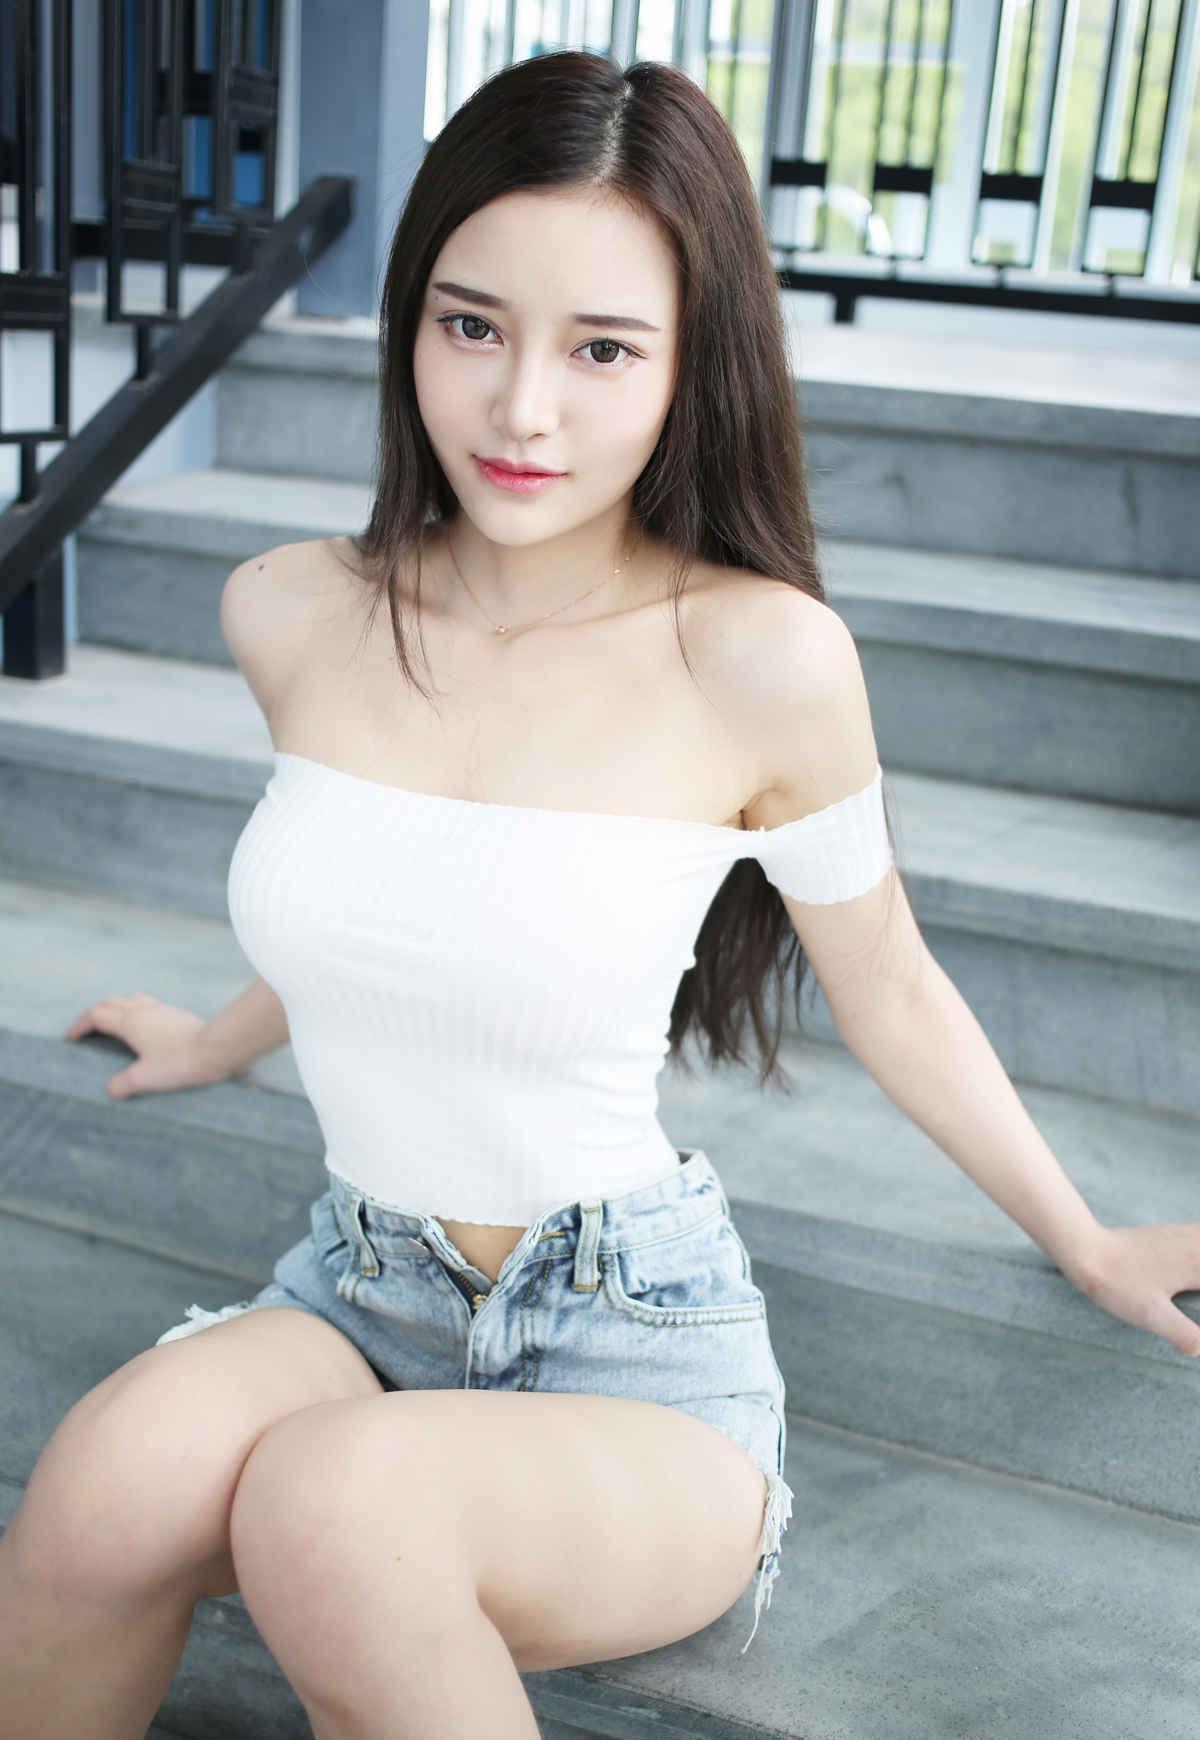 Pretty hot girl